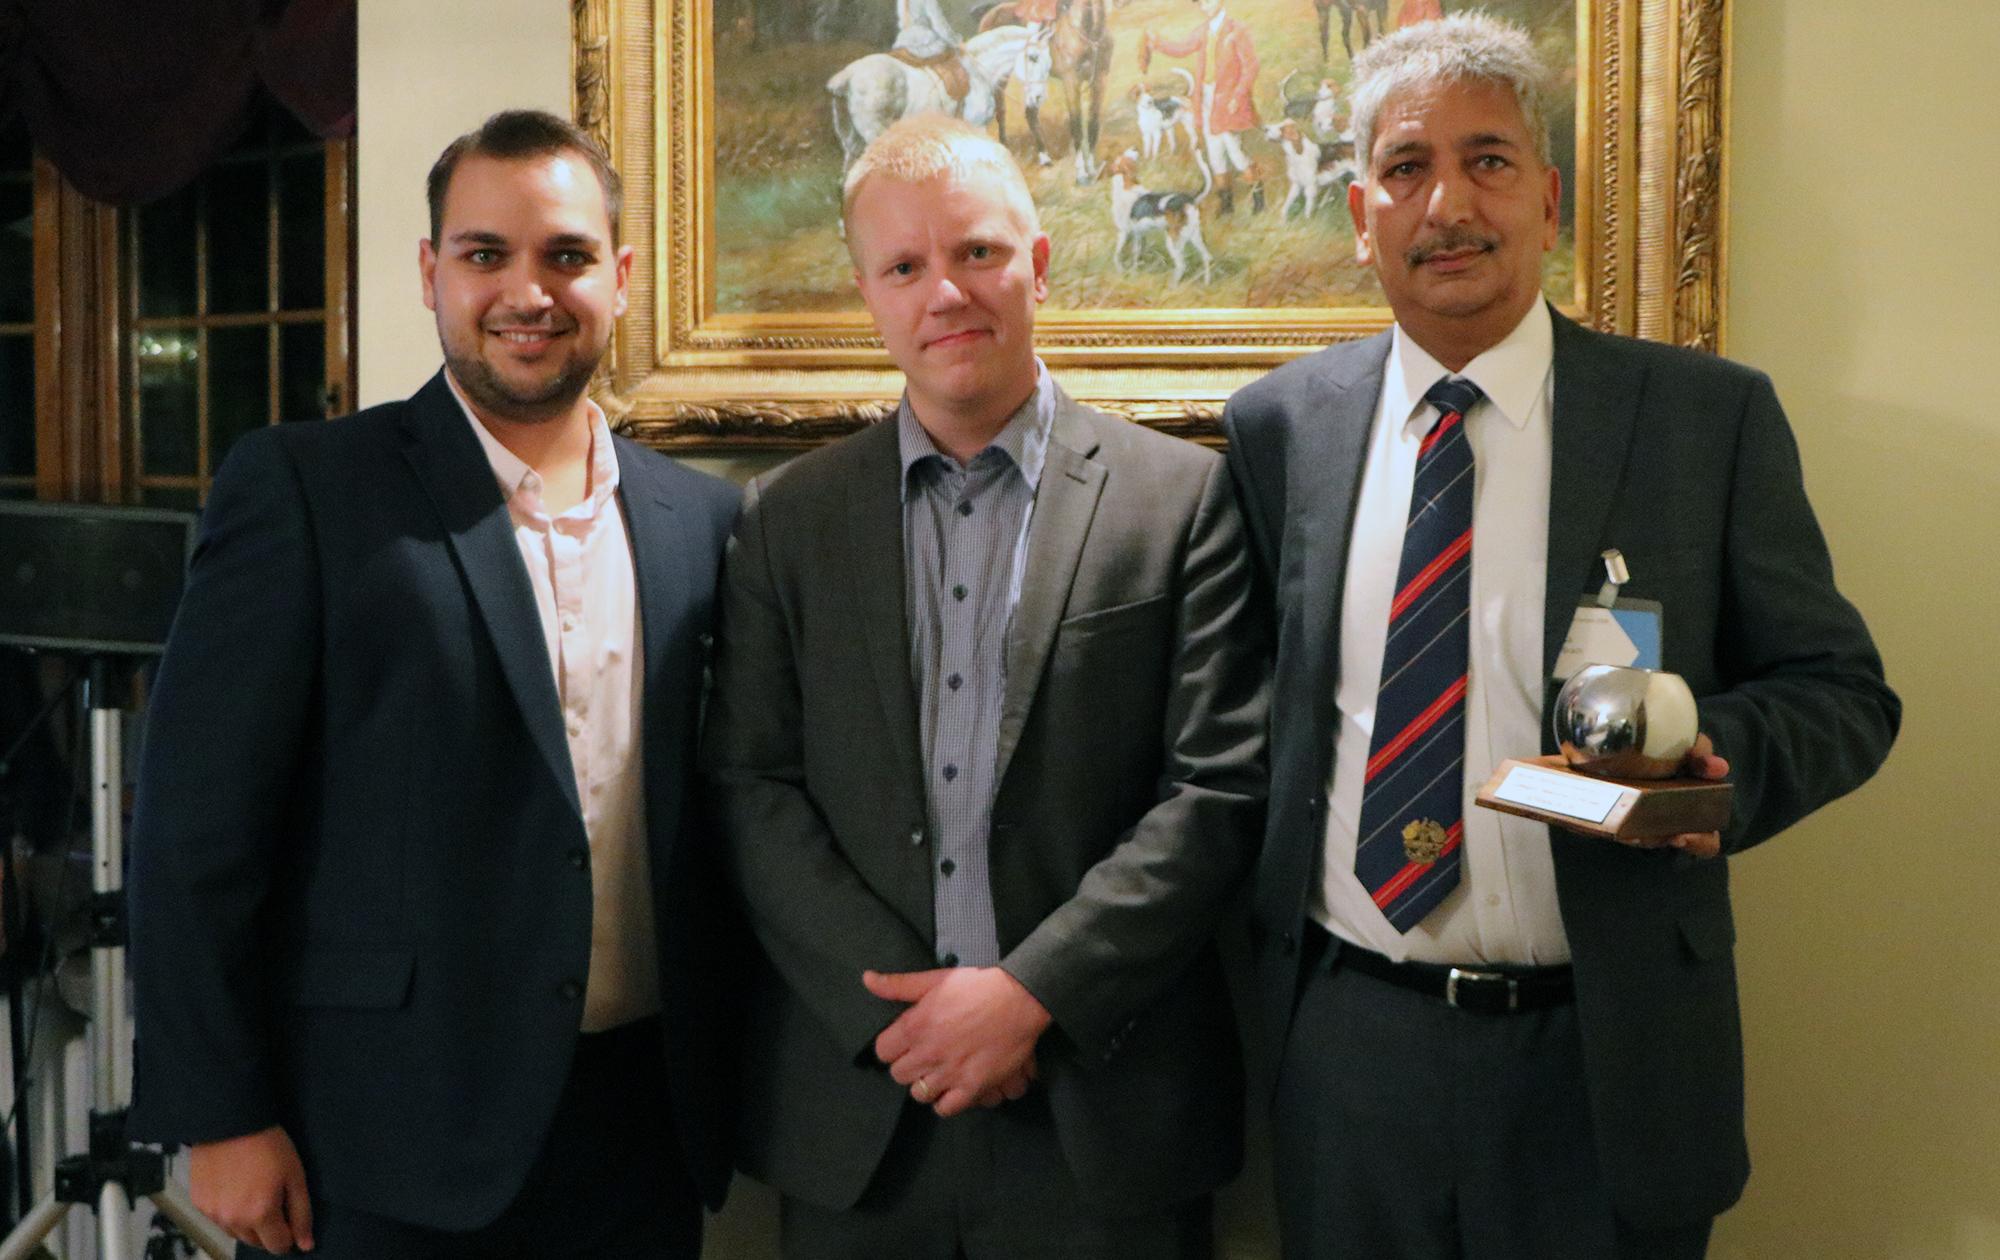 vexve valve distributor award